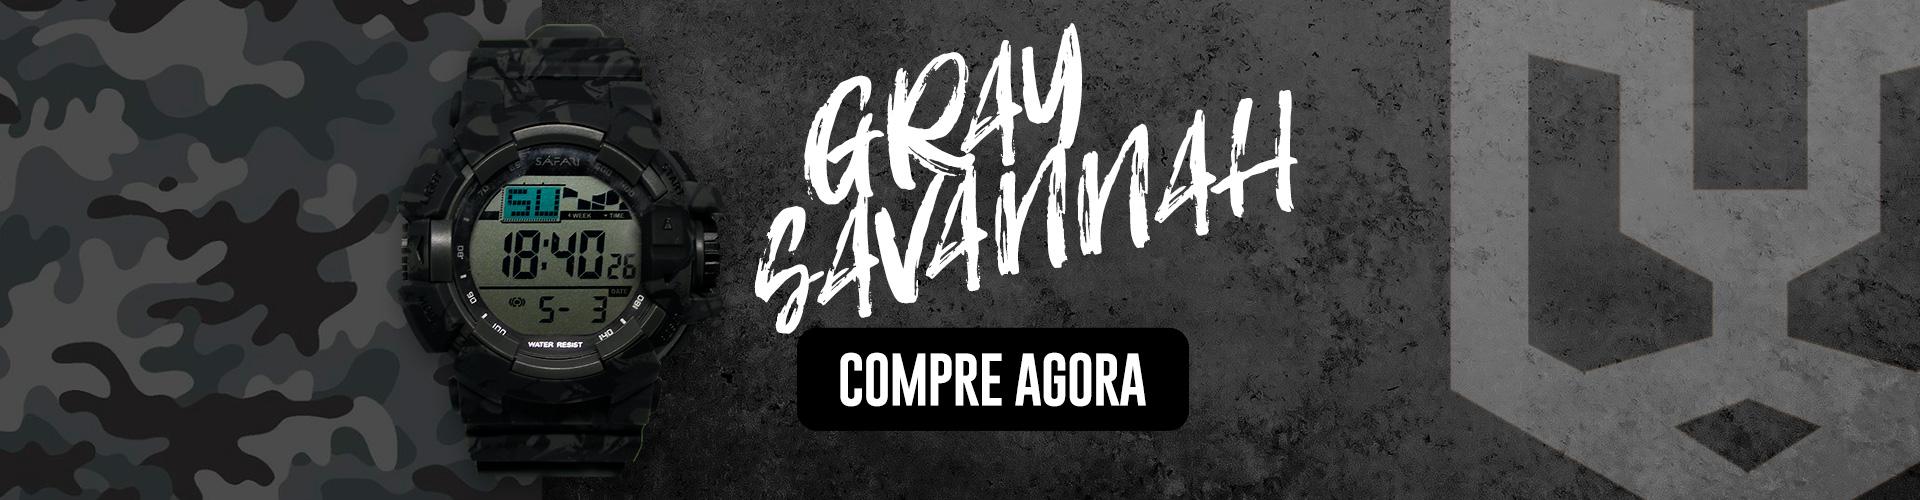 Gray Savannah